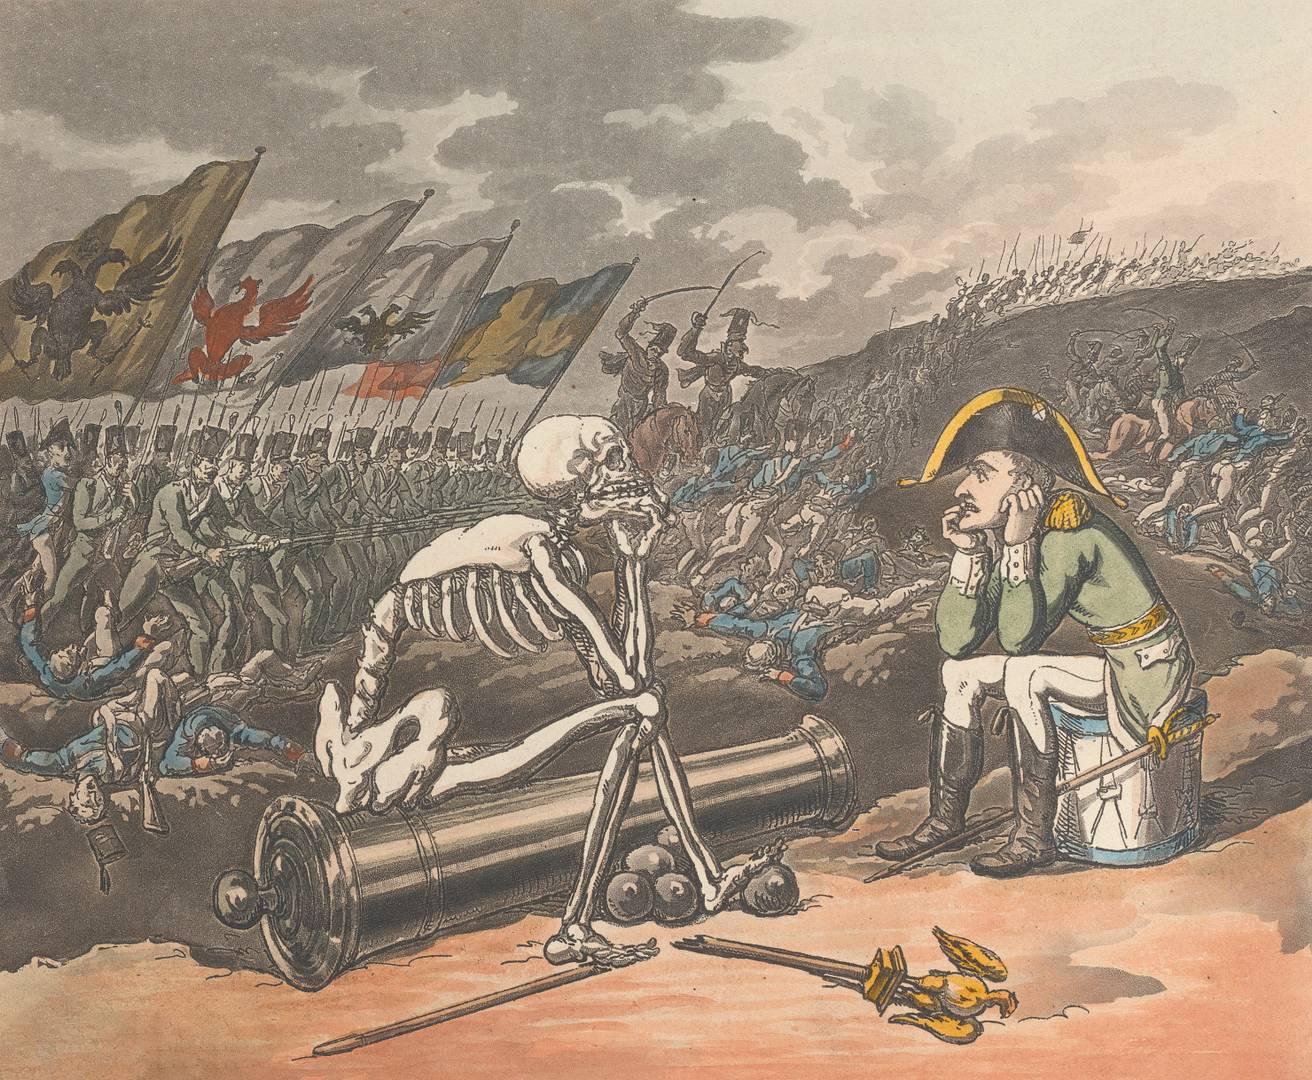 Томас Роулендсон. Смерть и Бонапарт — два короля террора. 1 января 1814 г.